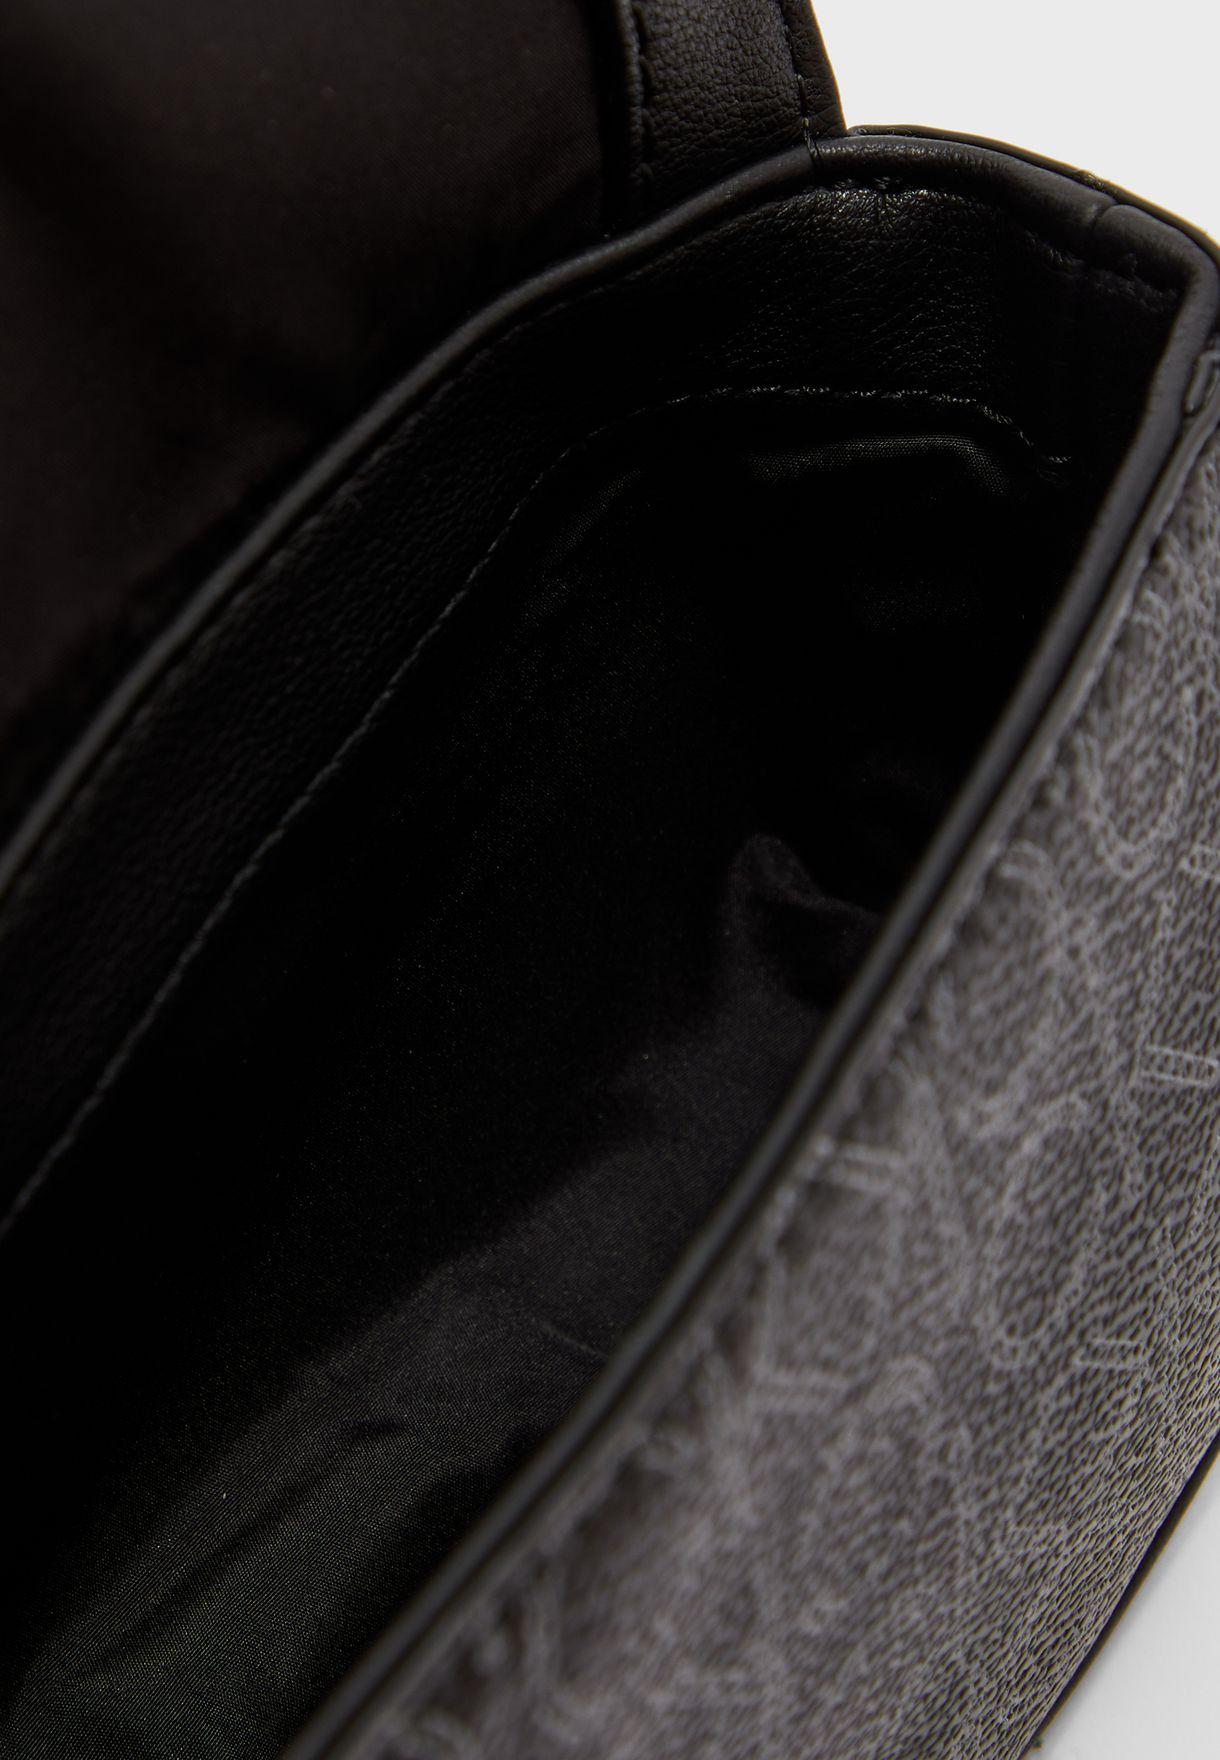 Logo Printed Flap Over Waist bag